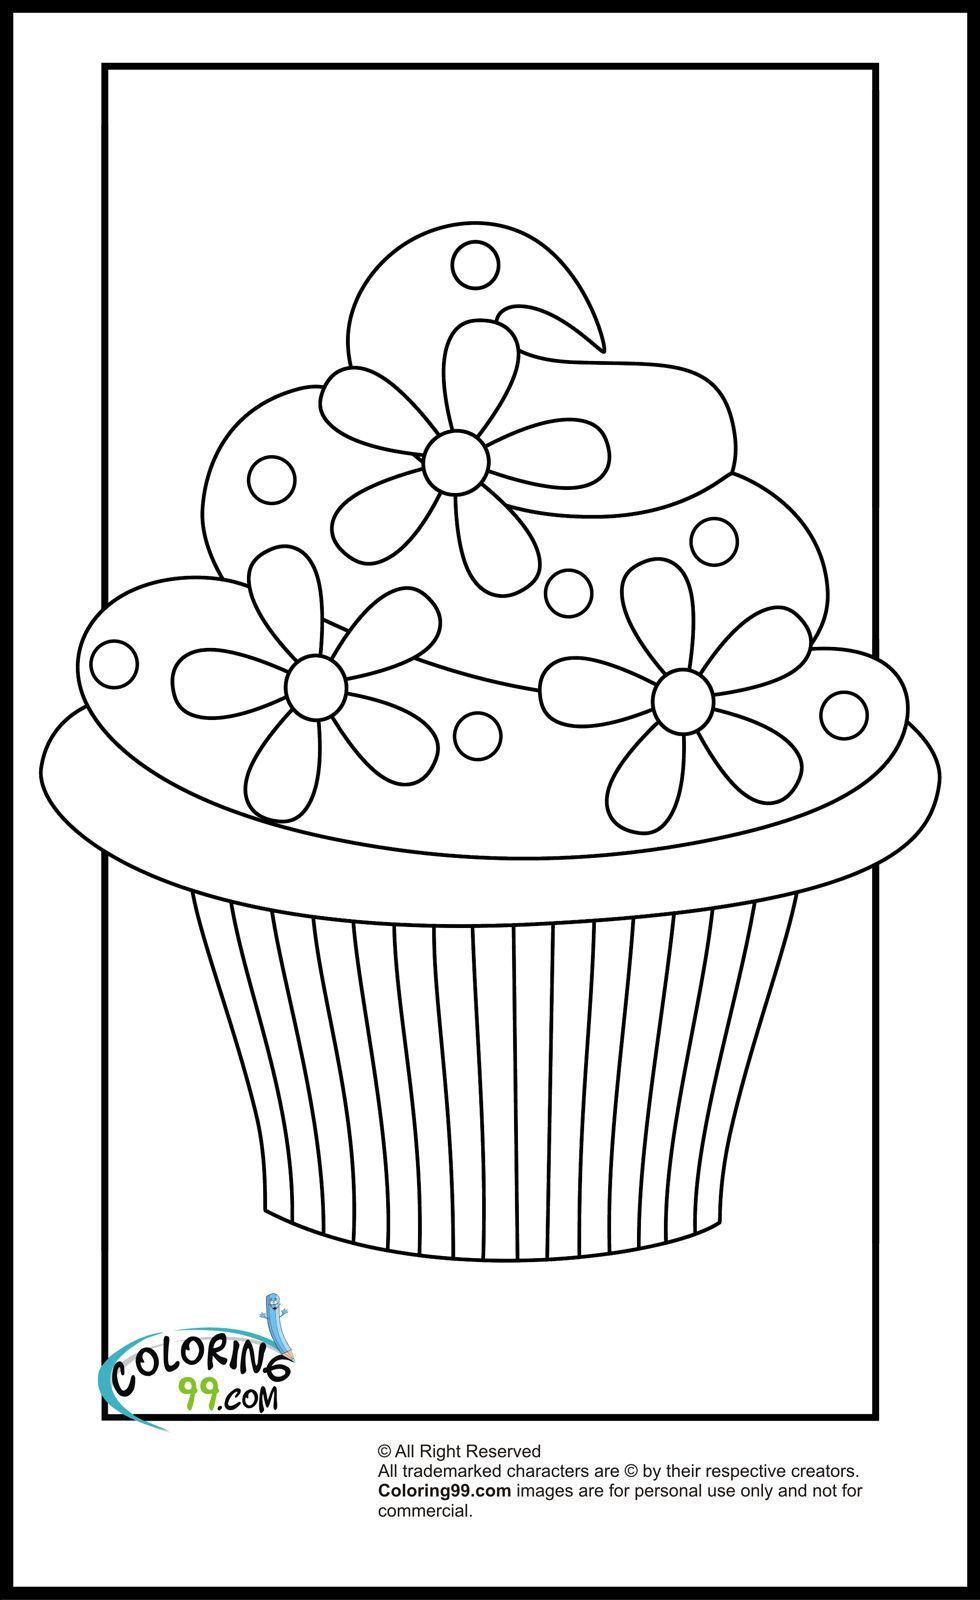 Cupcake Coloring Pages Cupcake Coloring Pages Coloring Pages For Kids Free Coloring Pages